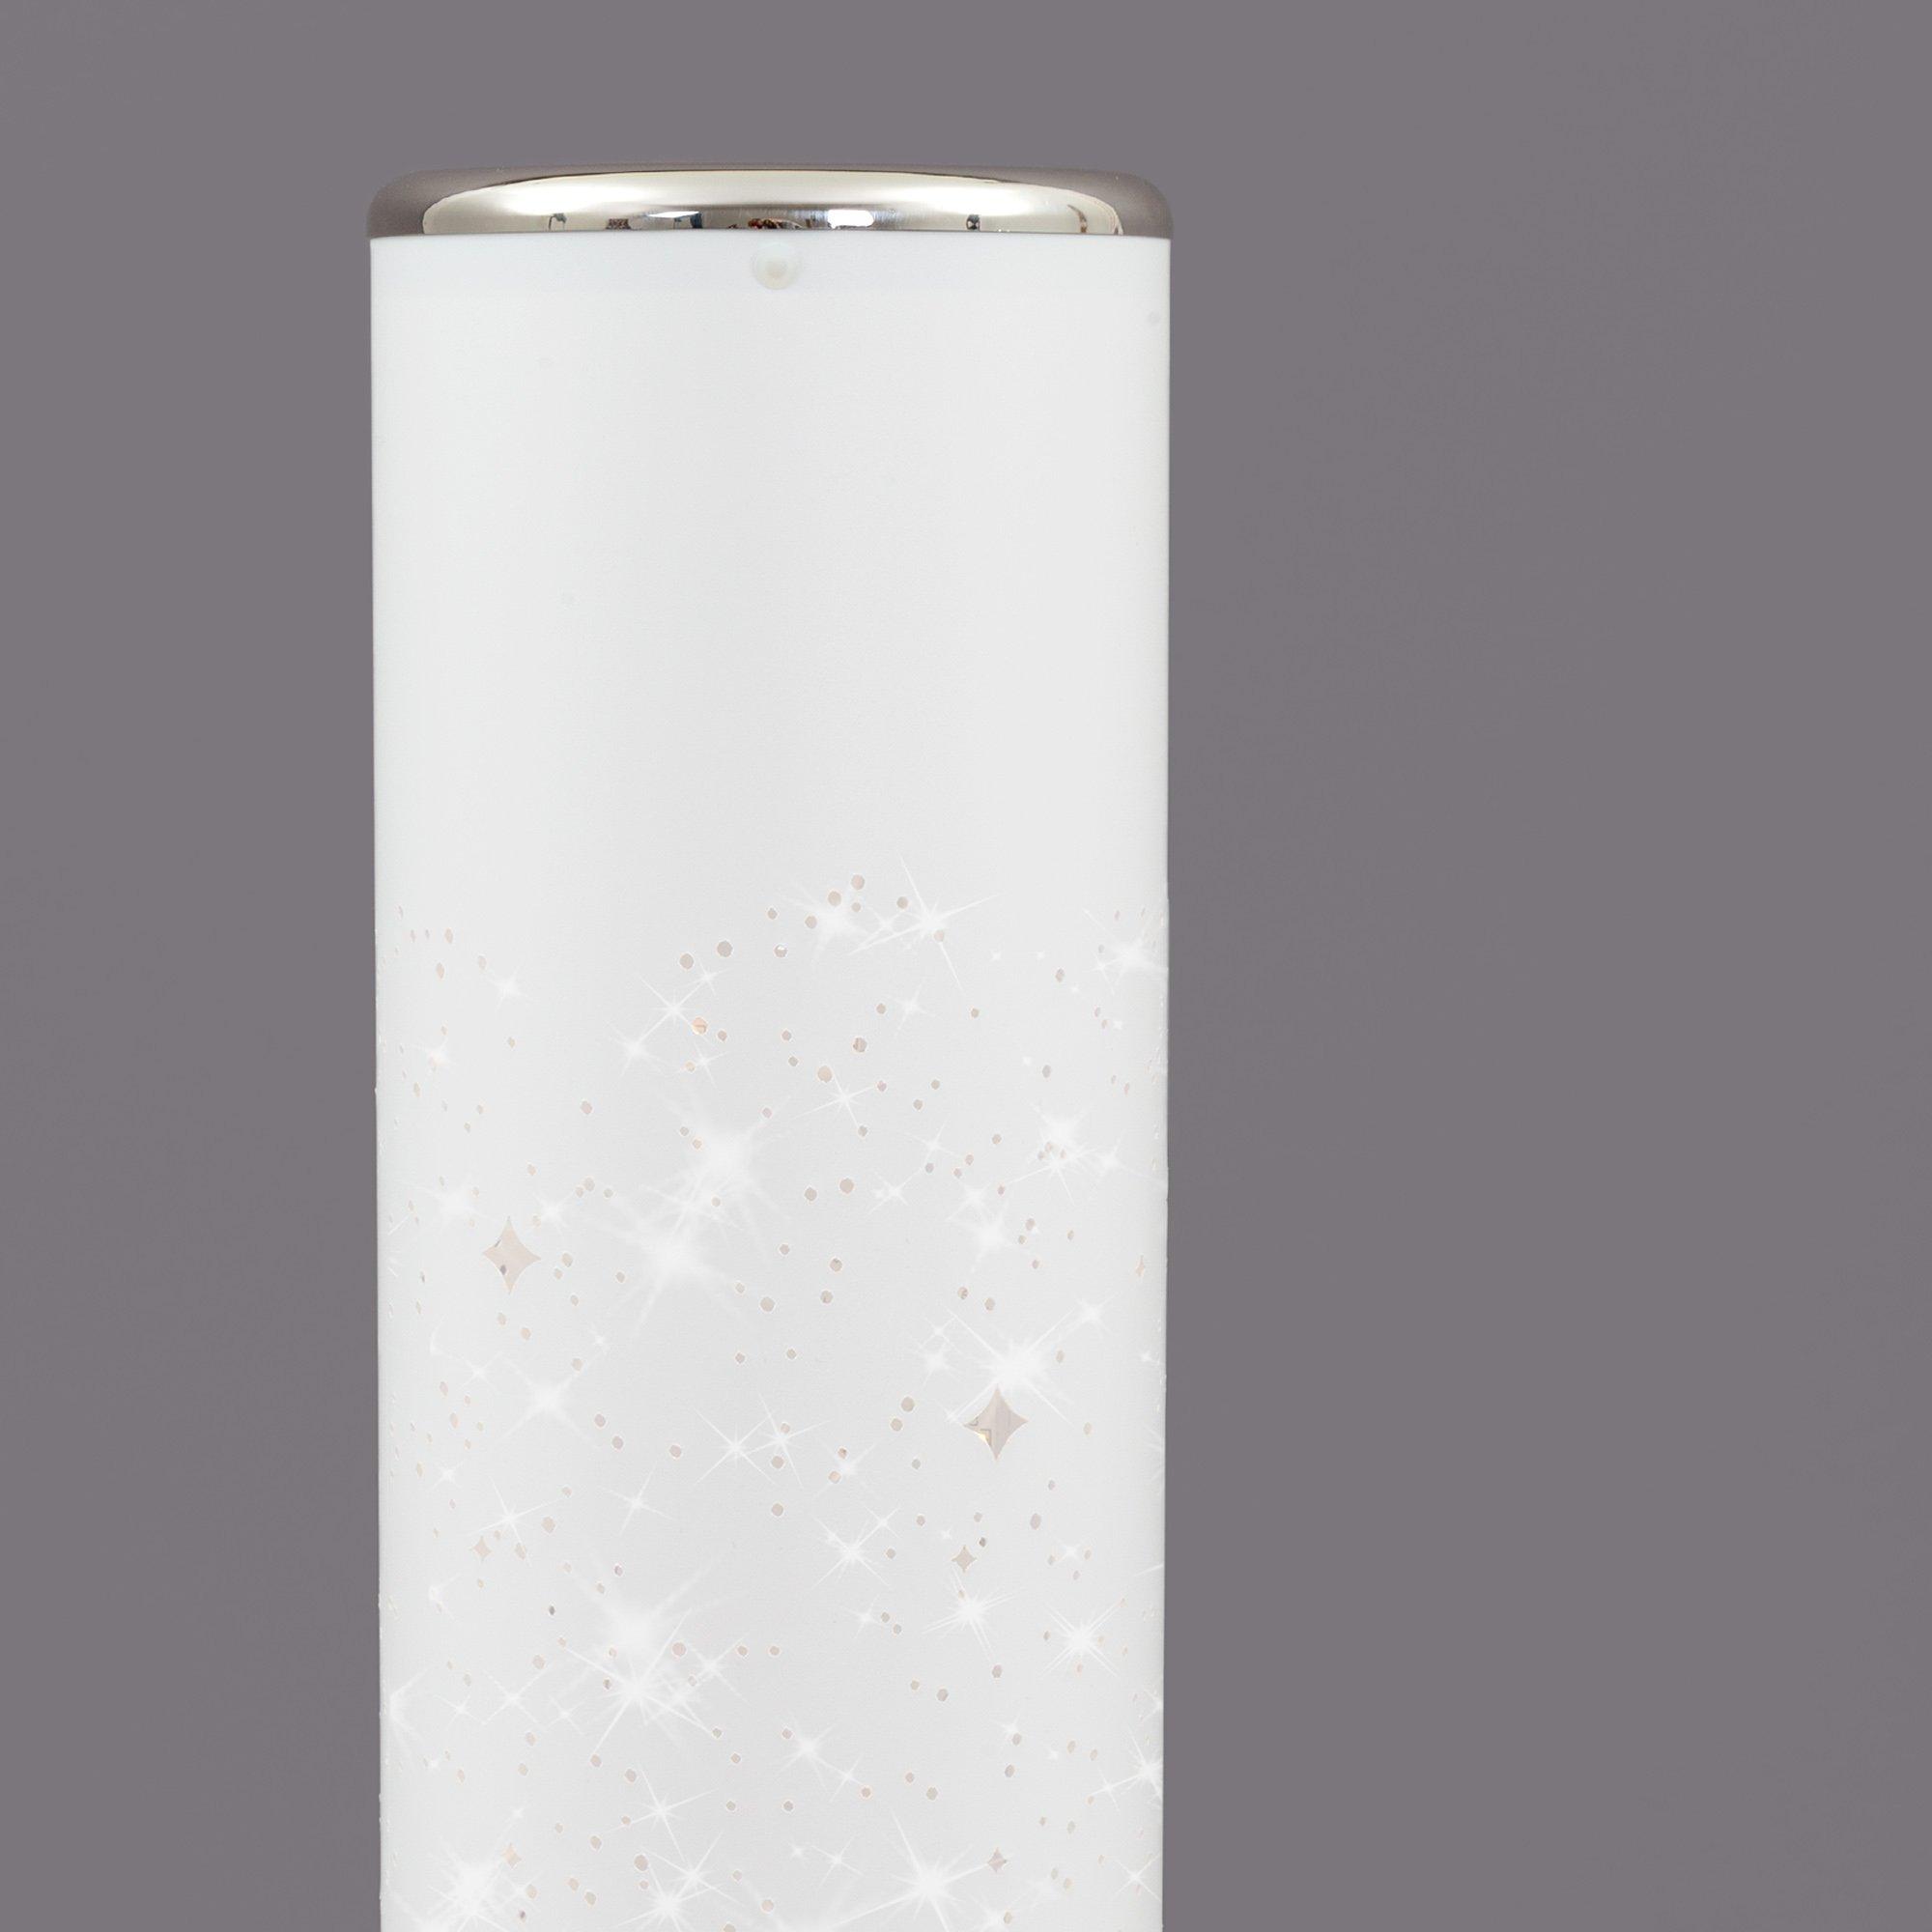 STERNENHIMMEL LED Stehleuchte Weiß-Chrom